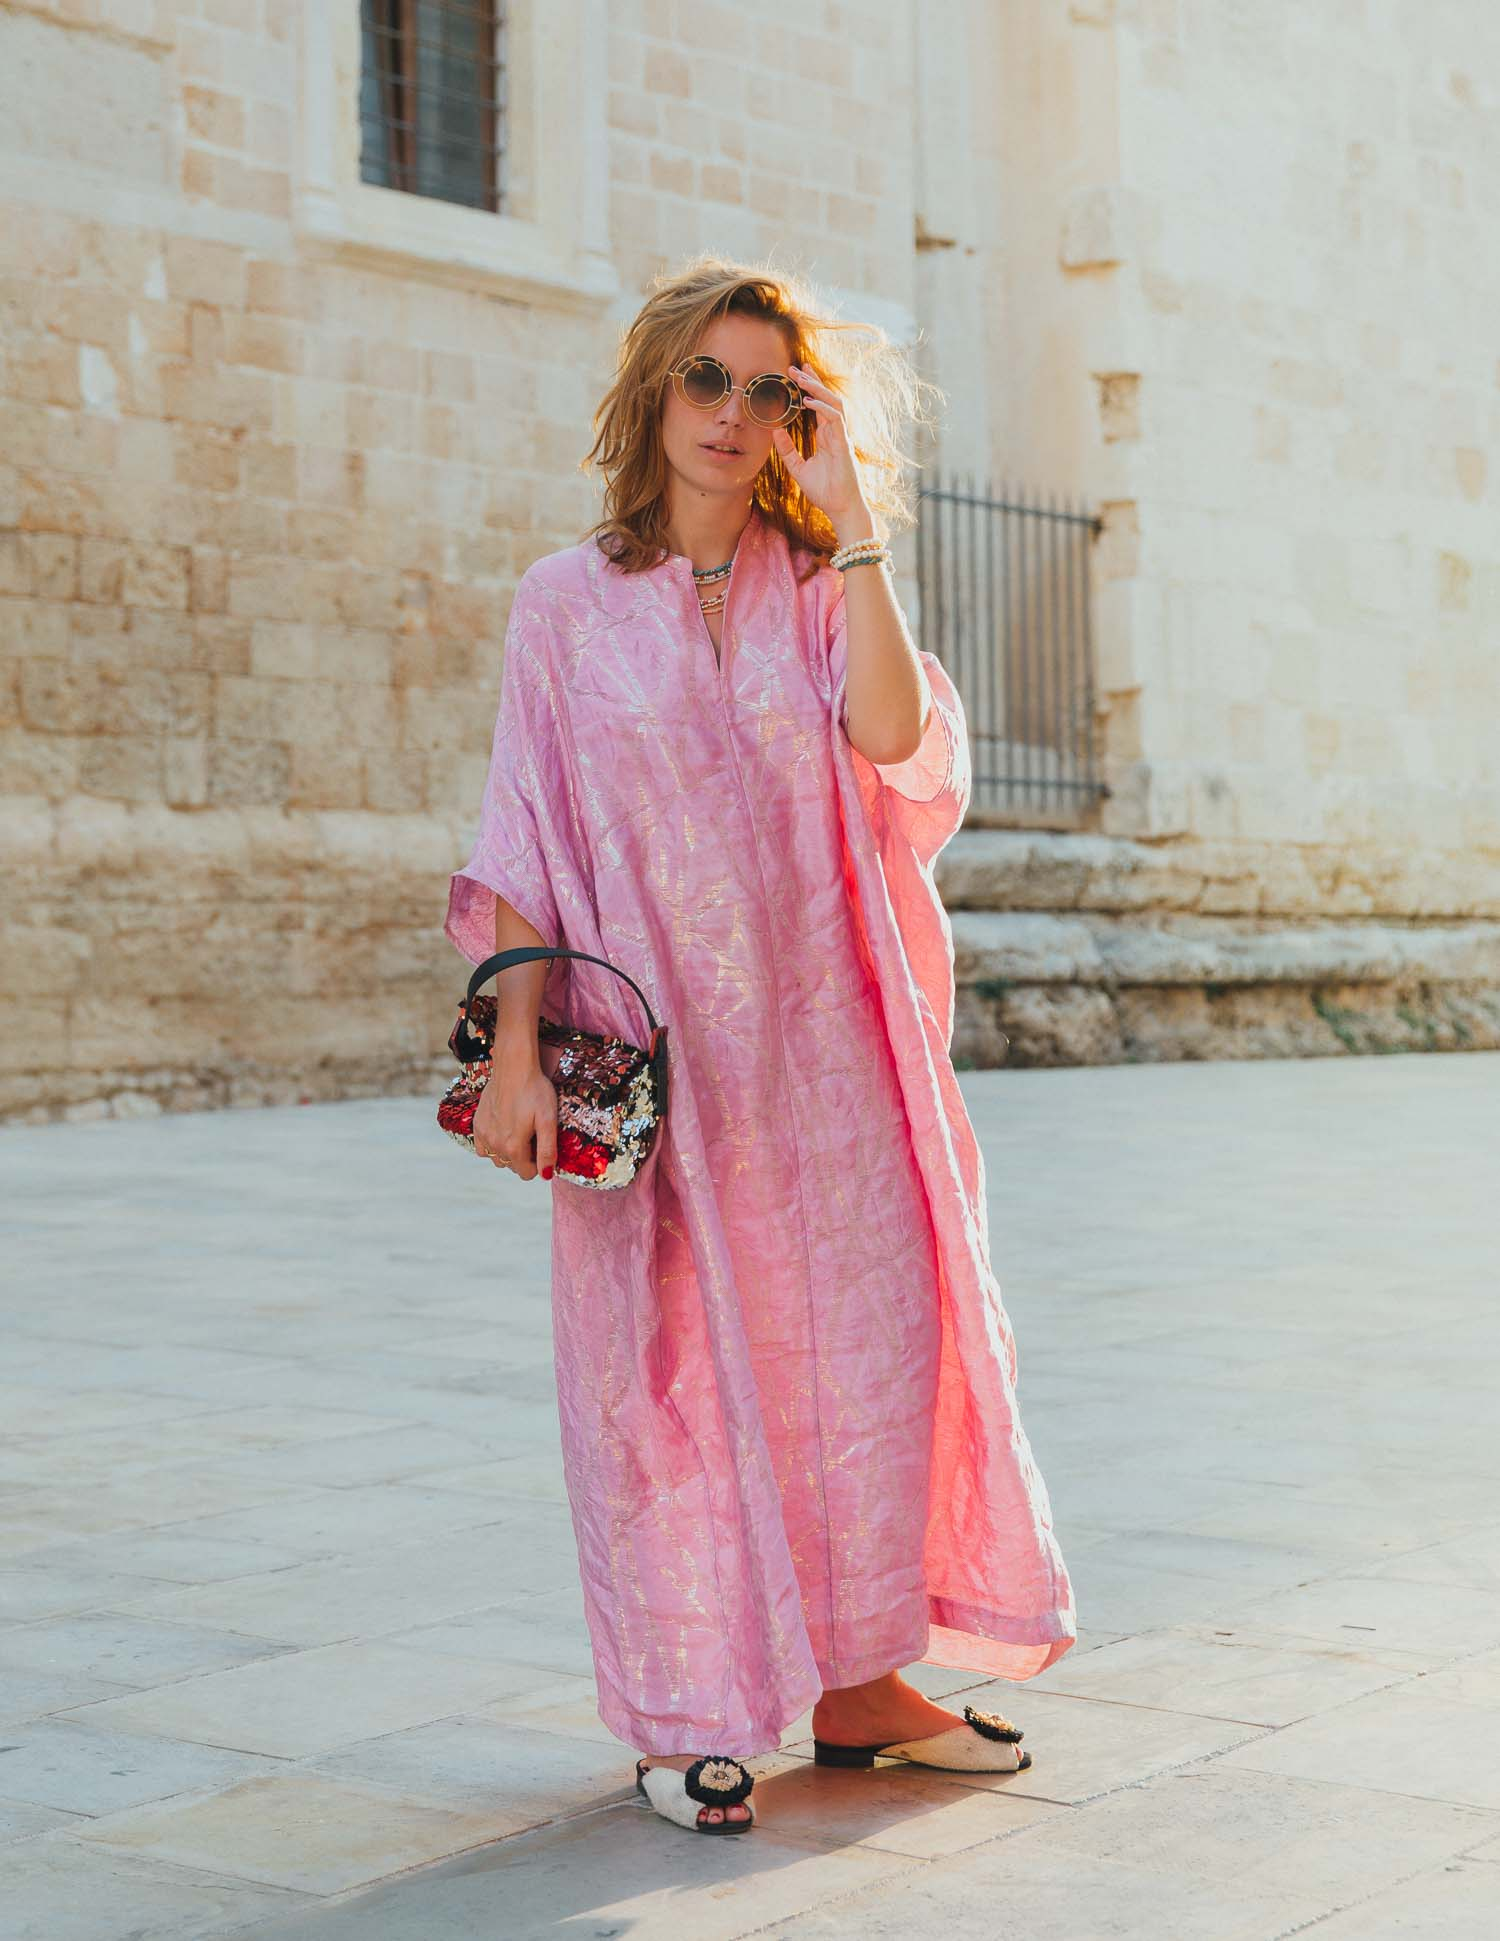 silk kaftan  Hennes & Mauritz  sequin baguette  Fendi  sunglasses   Linda Farrow   hair  uncombed